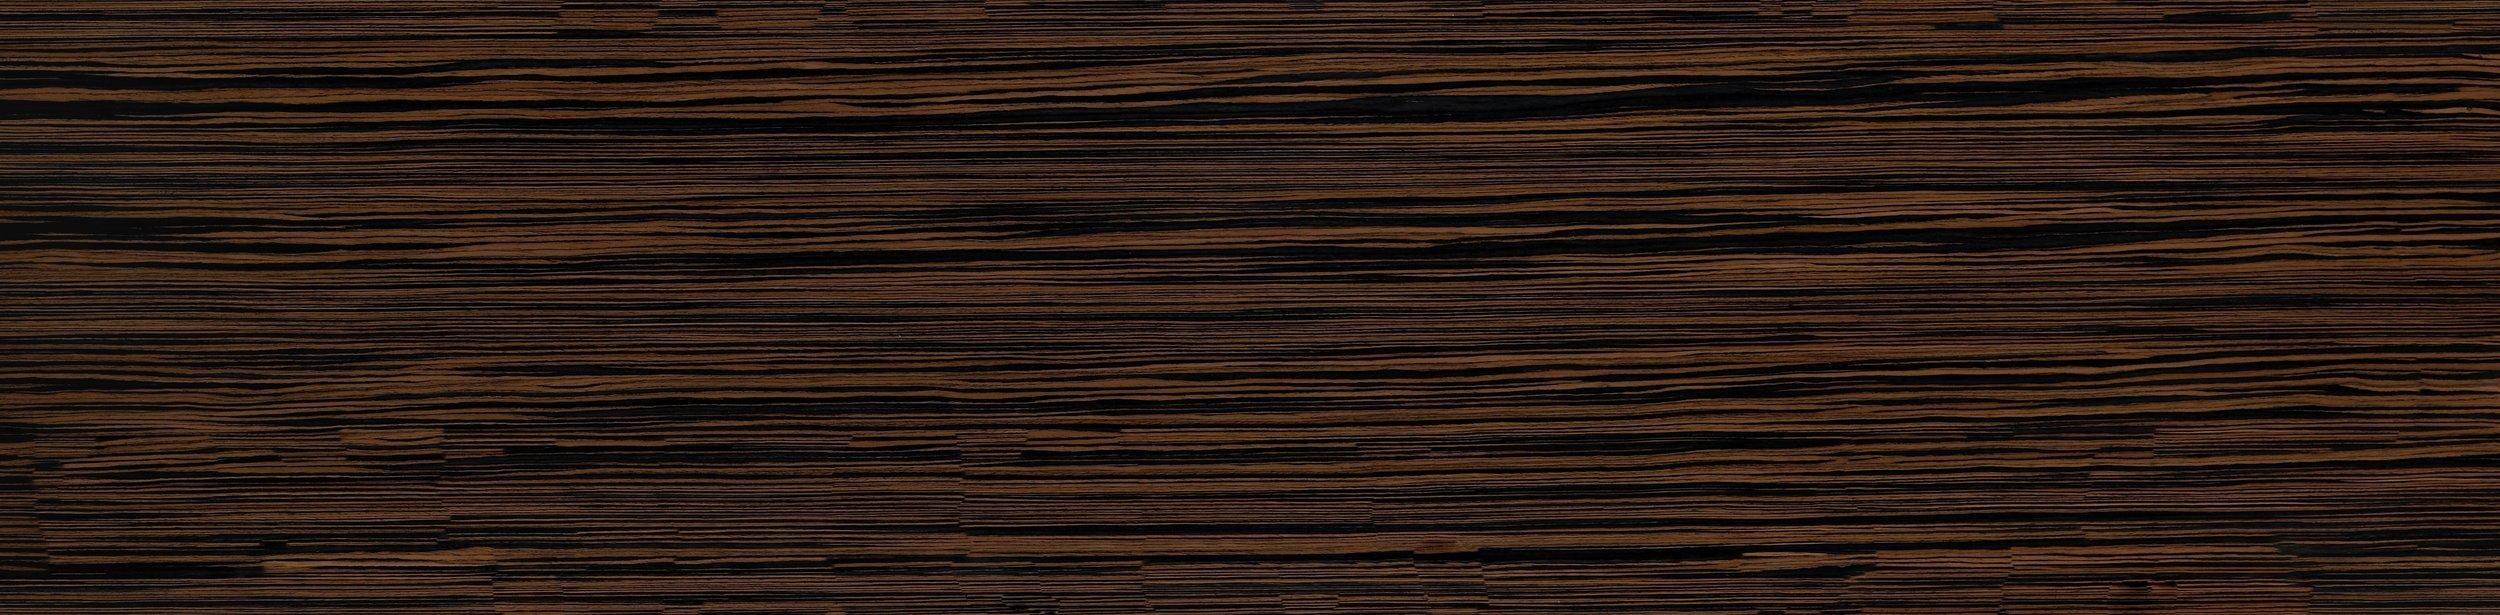 Item+Ebony+10.41+%28250x60cm%29.jpg